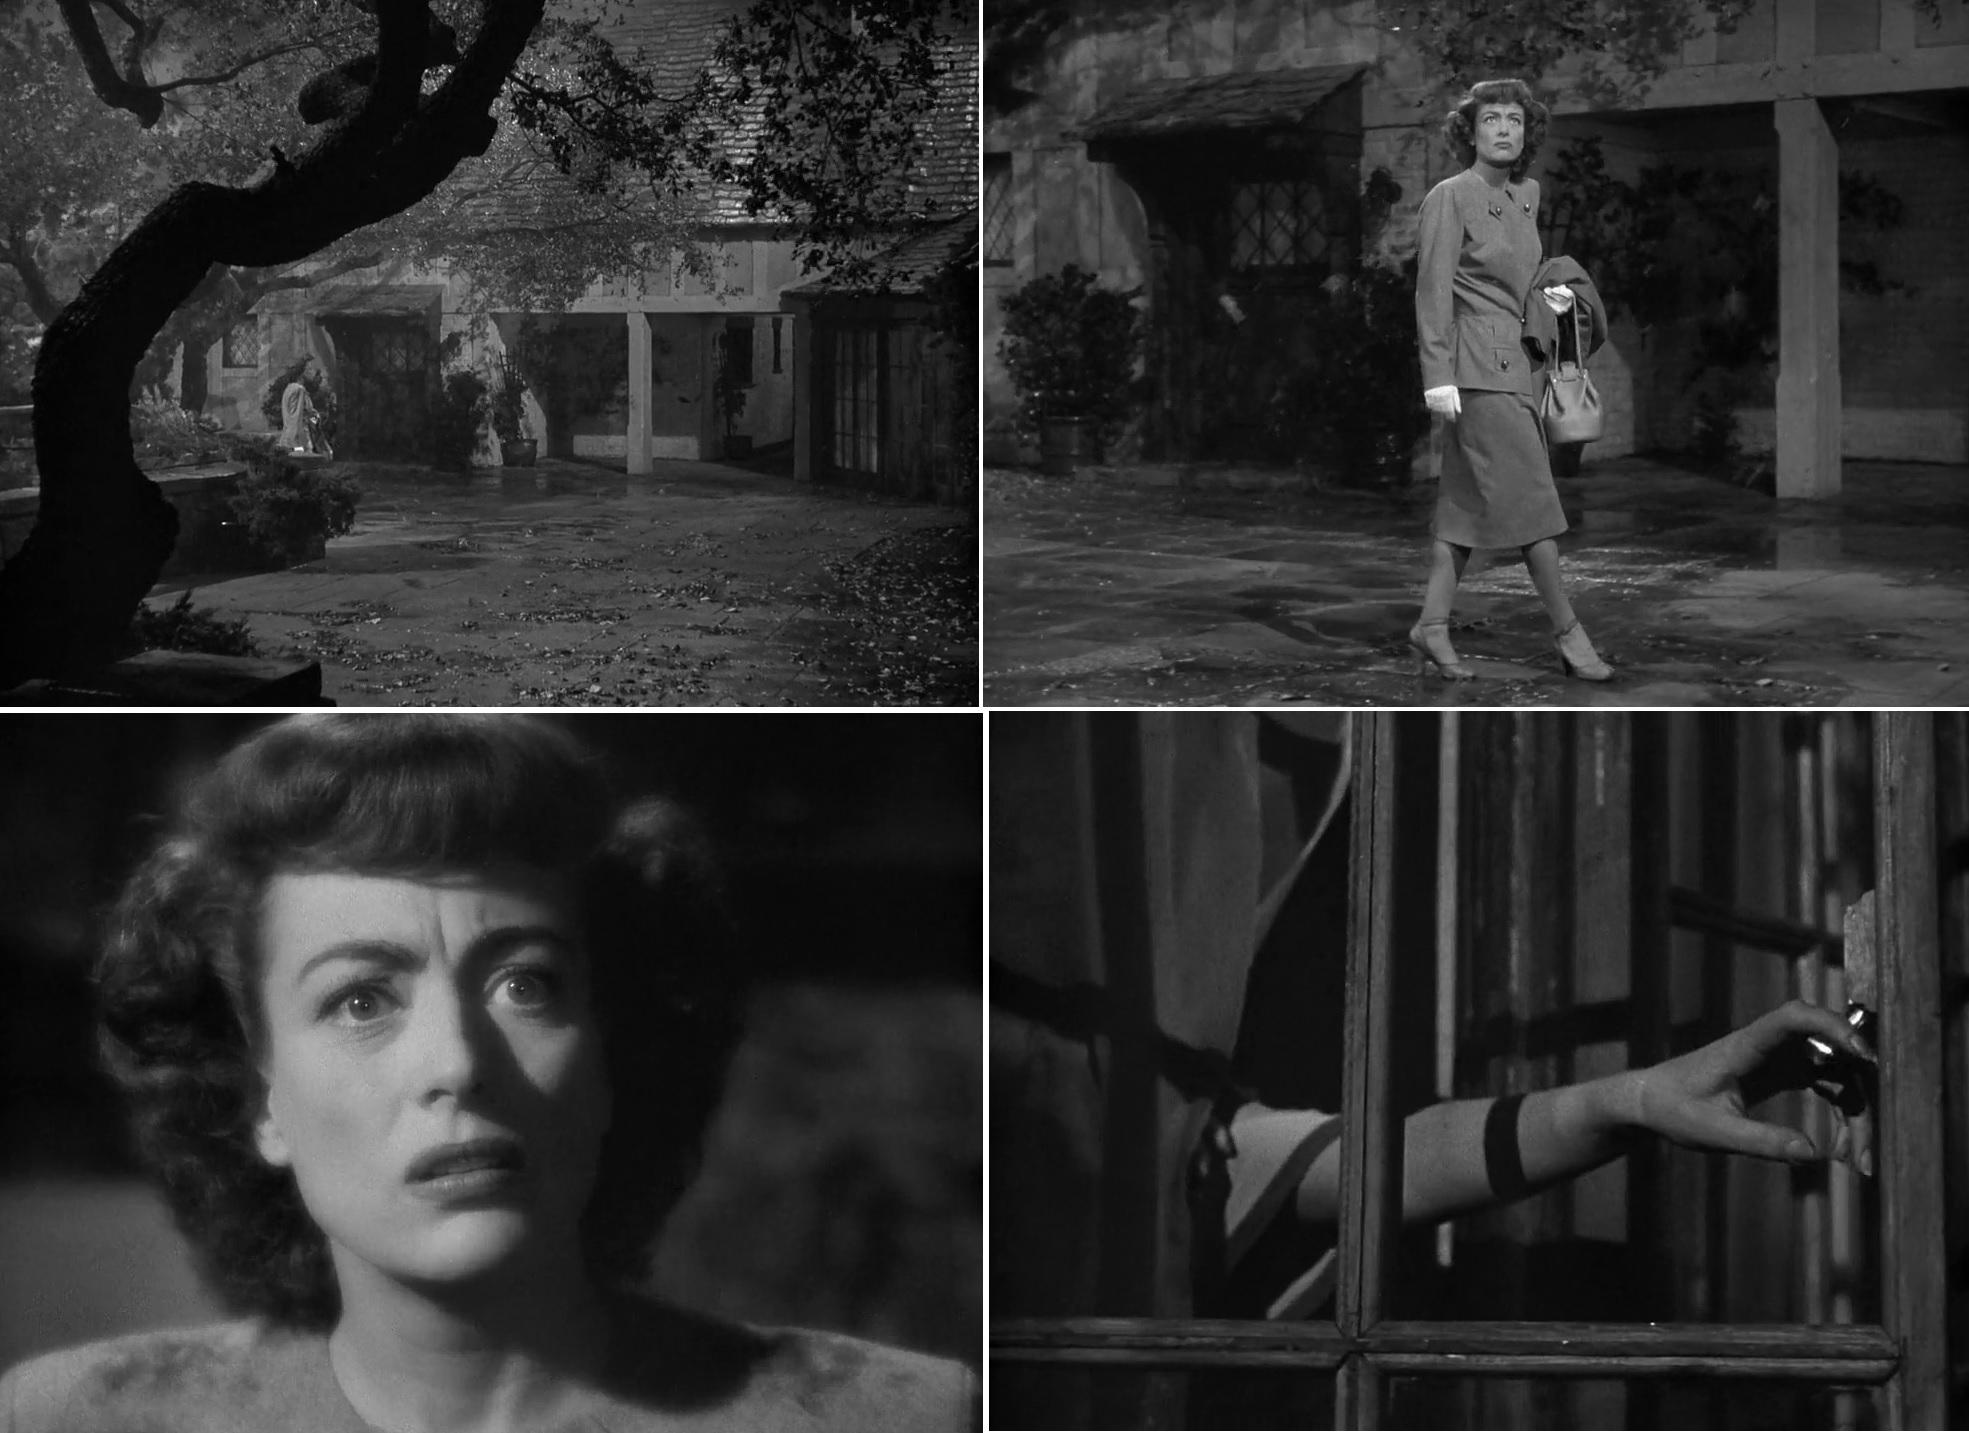 Megszállott (Possessed. Curtis Bernhardt, 1947)